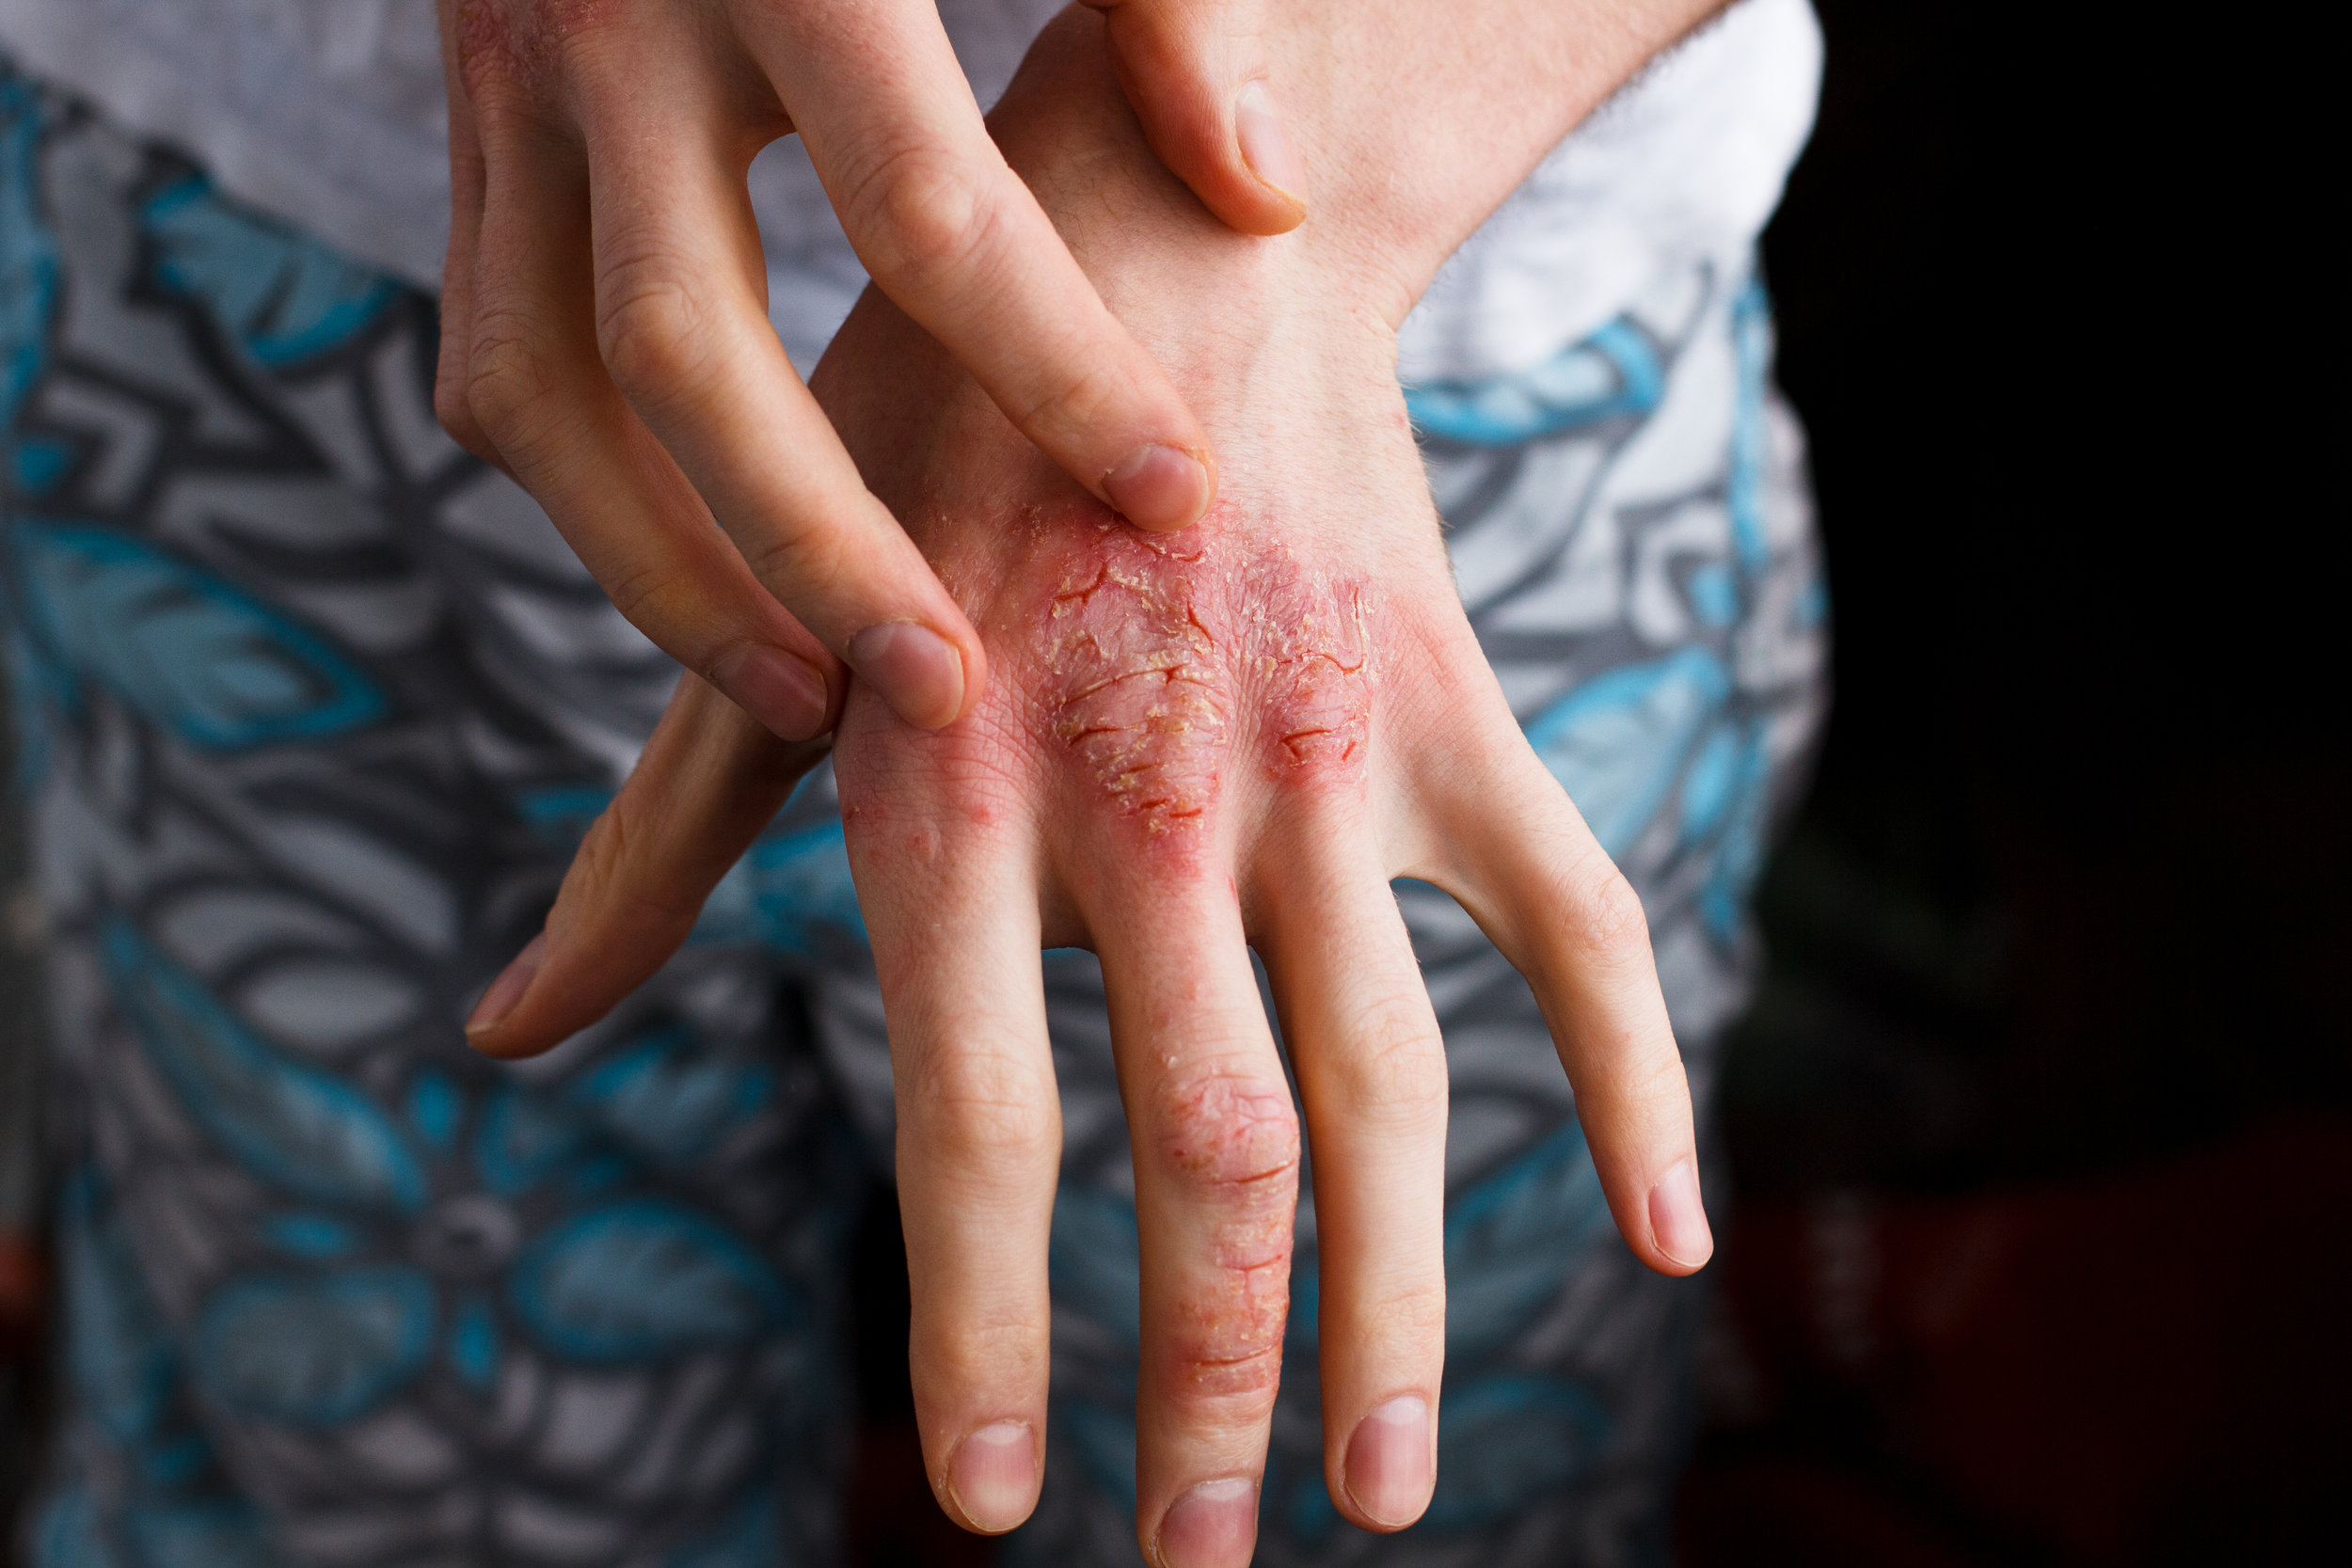 psoriasis, psoriasis awareness month, what is psoriasis, what causes psoriasis, psoriasis symptoms, symptoms of psoriasis, treating psoriasis, psoriasis treatment, what causes psoriasis, types of psoriasis, psoriasis doctor, dermatologist, tampa dermatologist, tampa dermatology, dermatologist in tampa